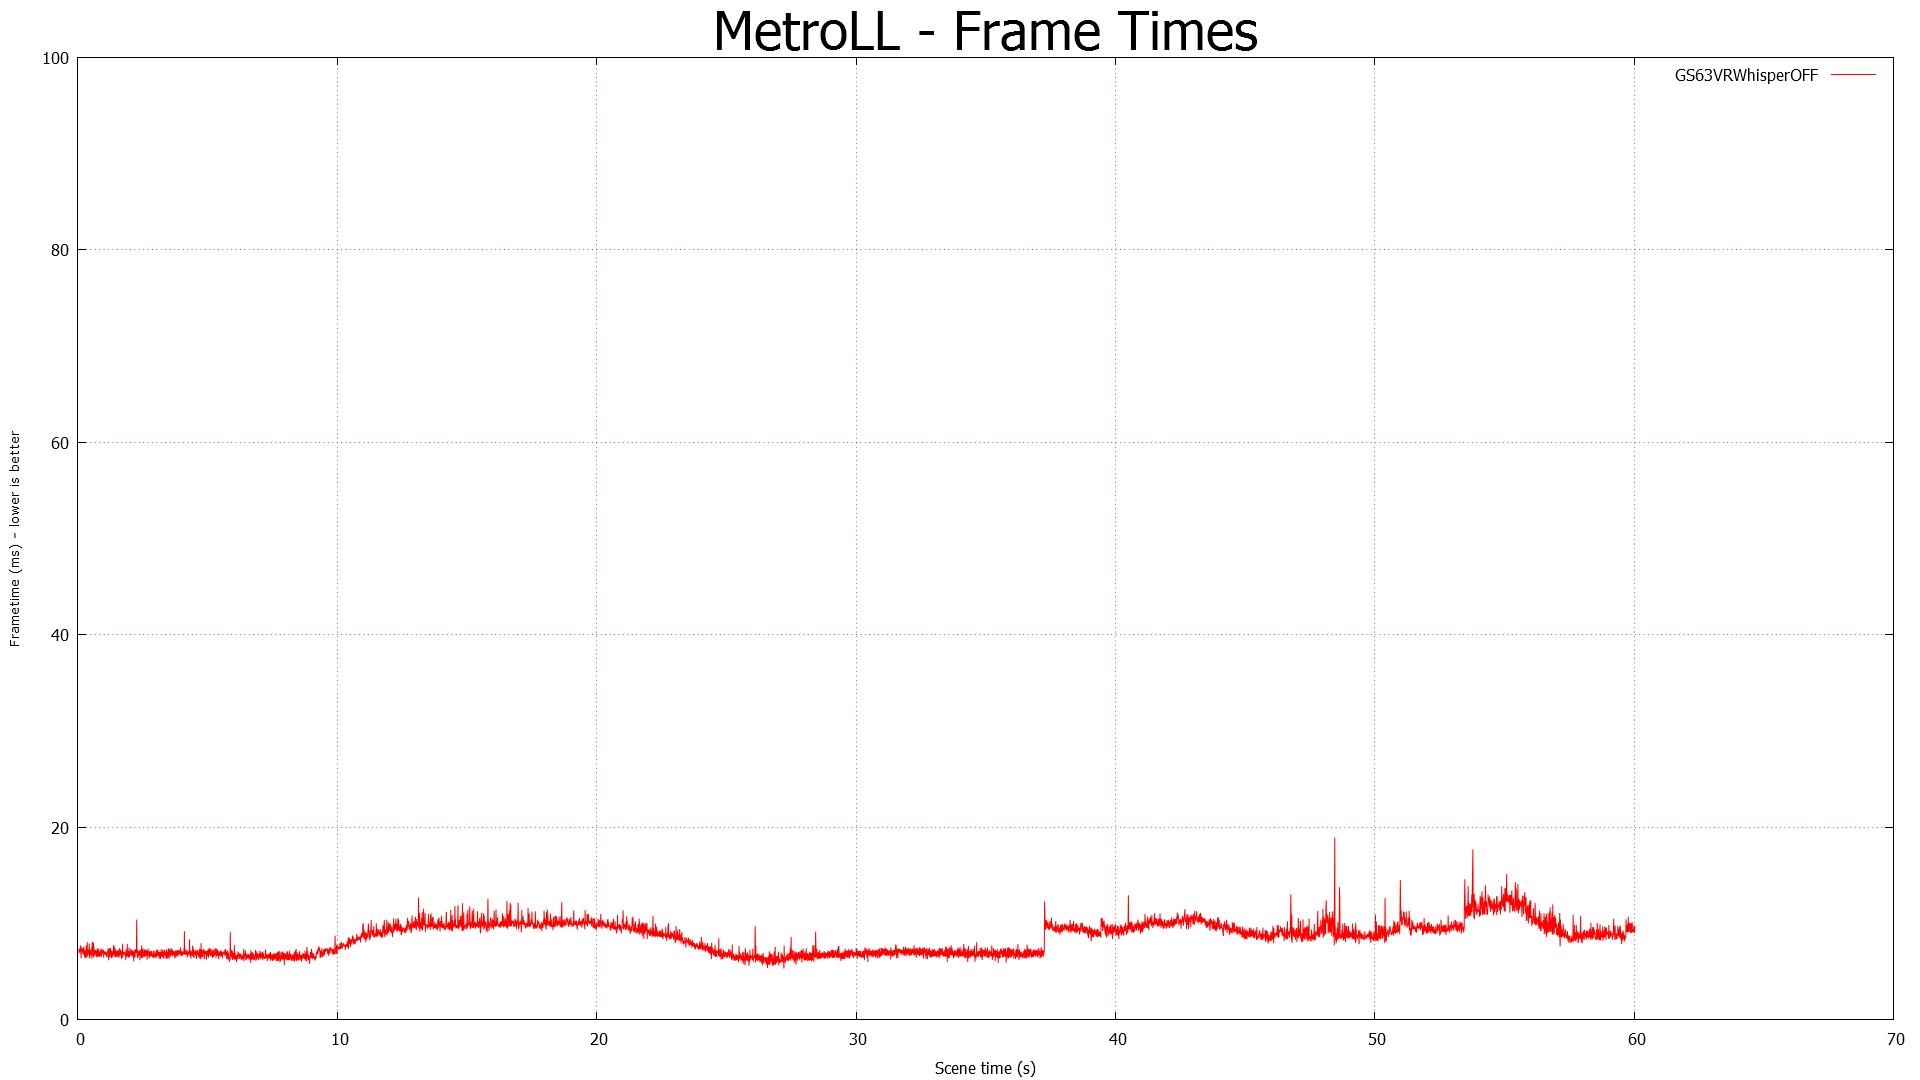 gs63vrwhisperoff-metroll-1920x1080.png